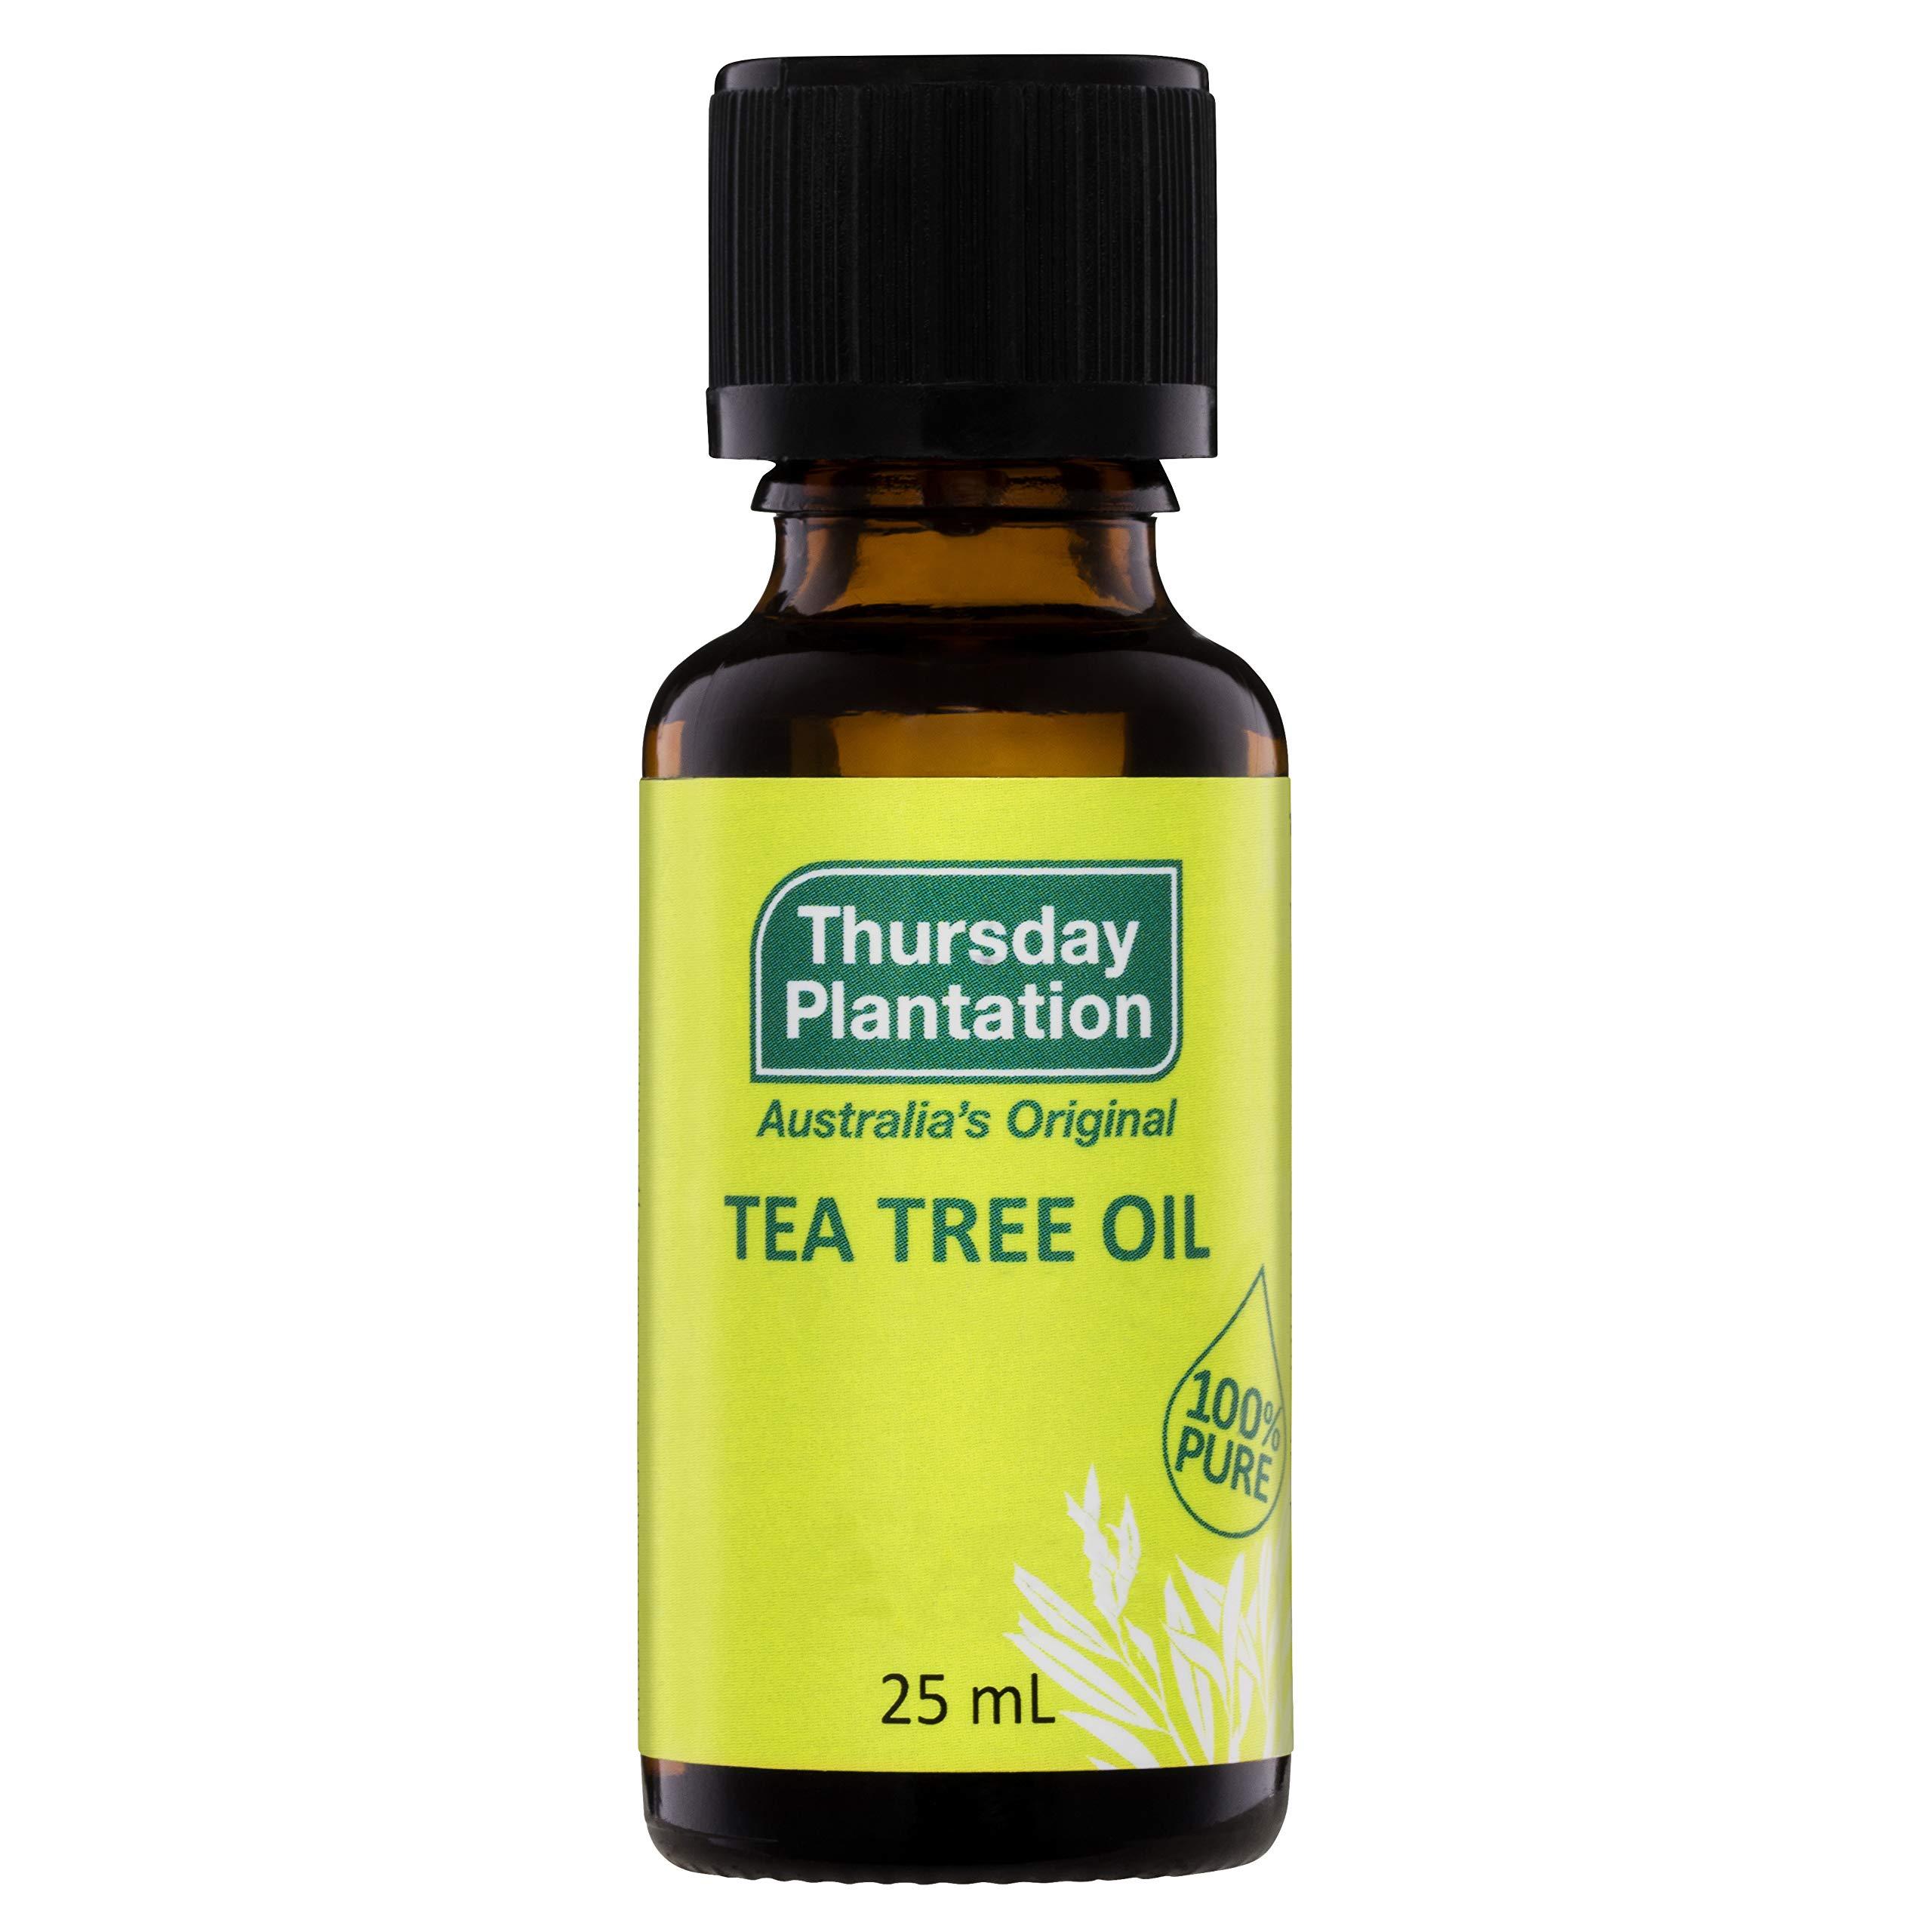 Thursday Plantation 100% Pure Tea Tree Oil - 25 ml